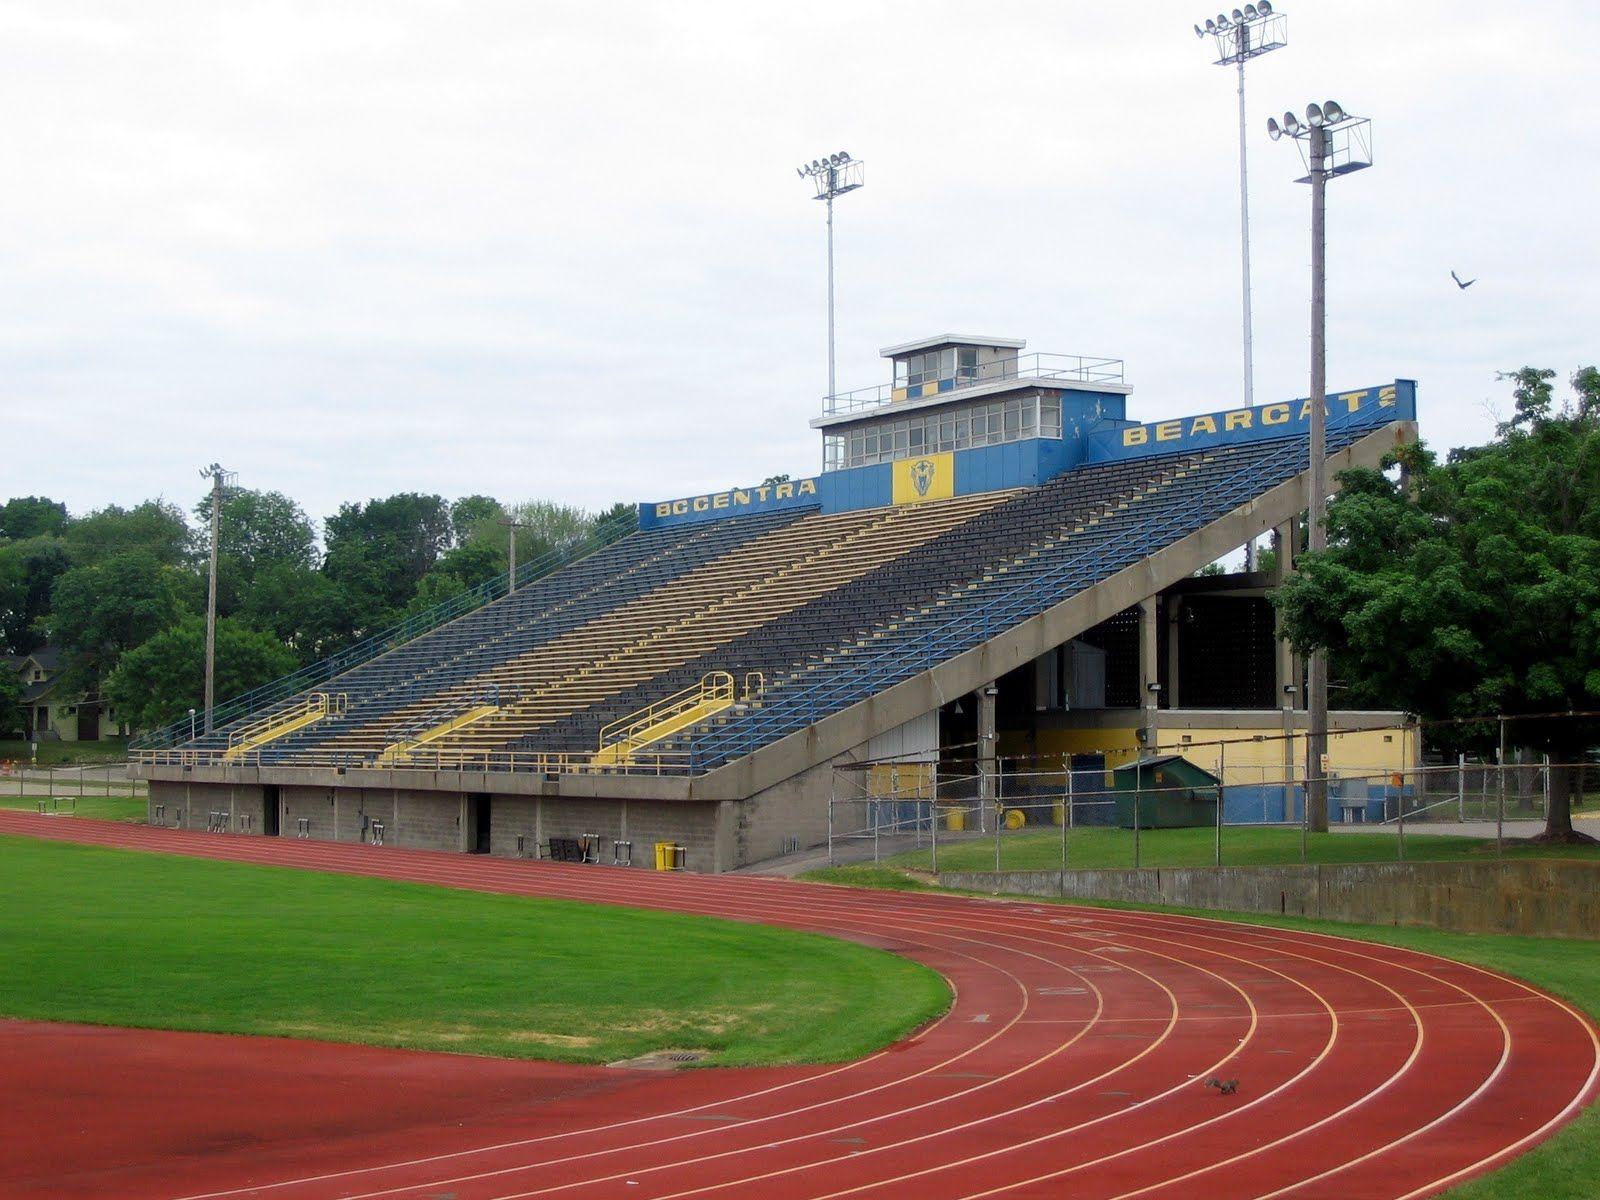 Geor own High School Football Stadium Geor own Texas Pinterest